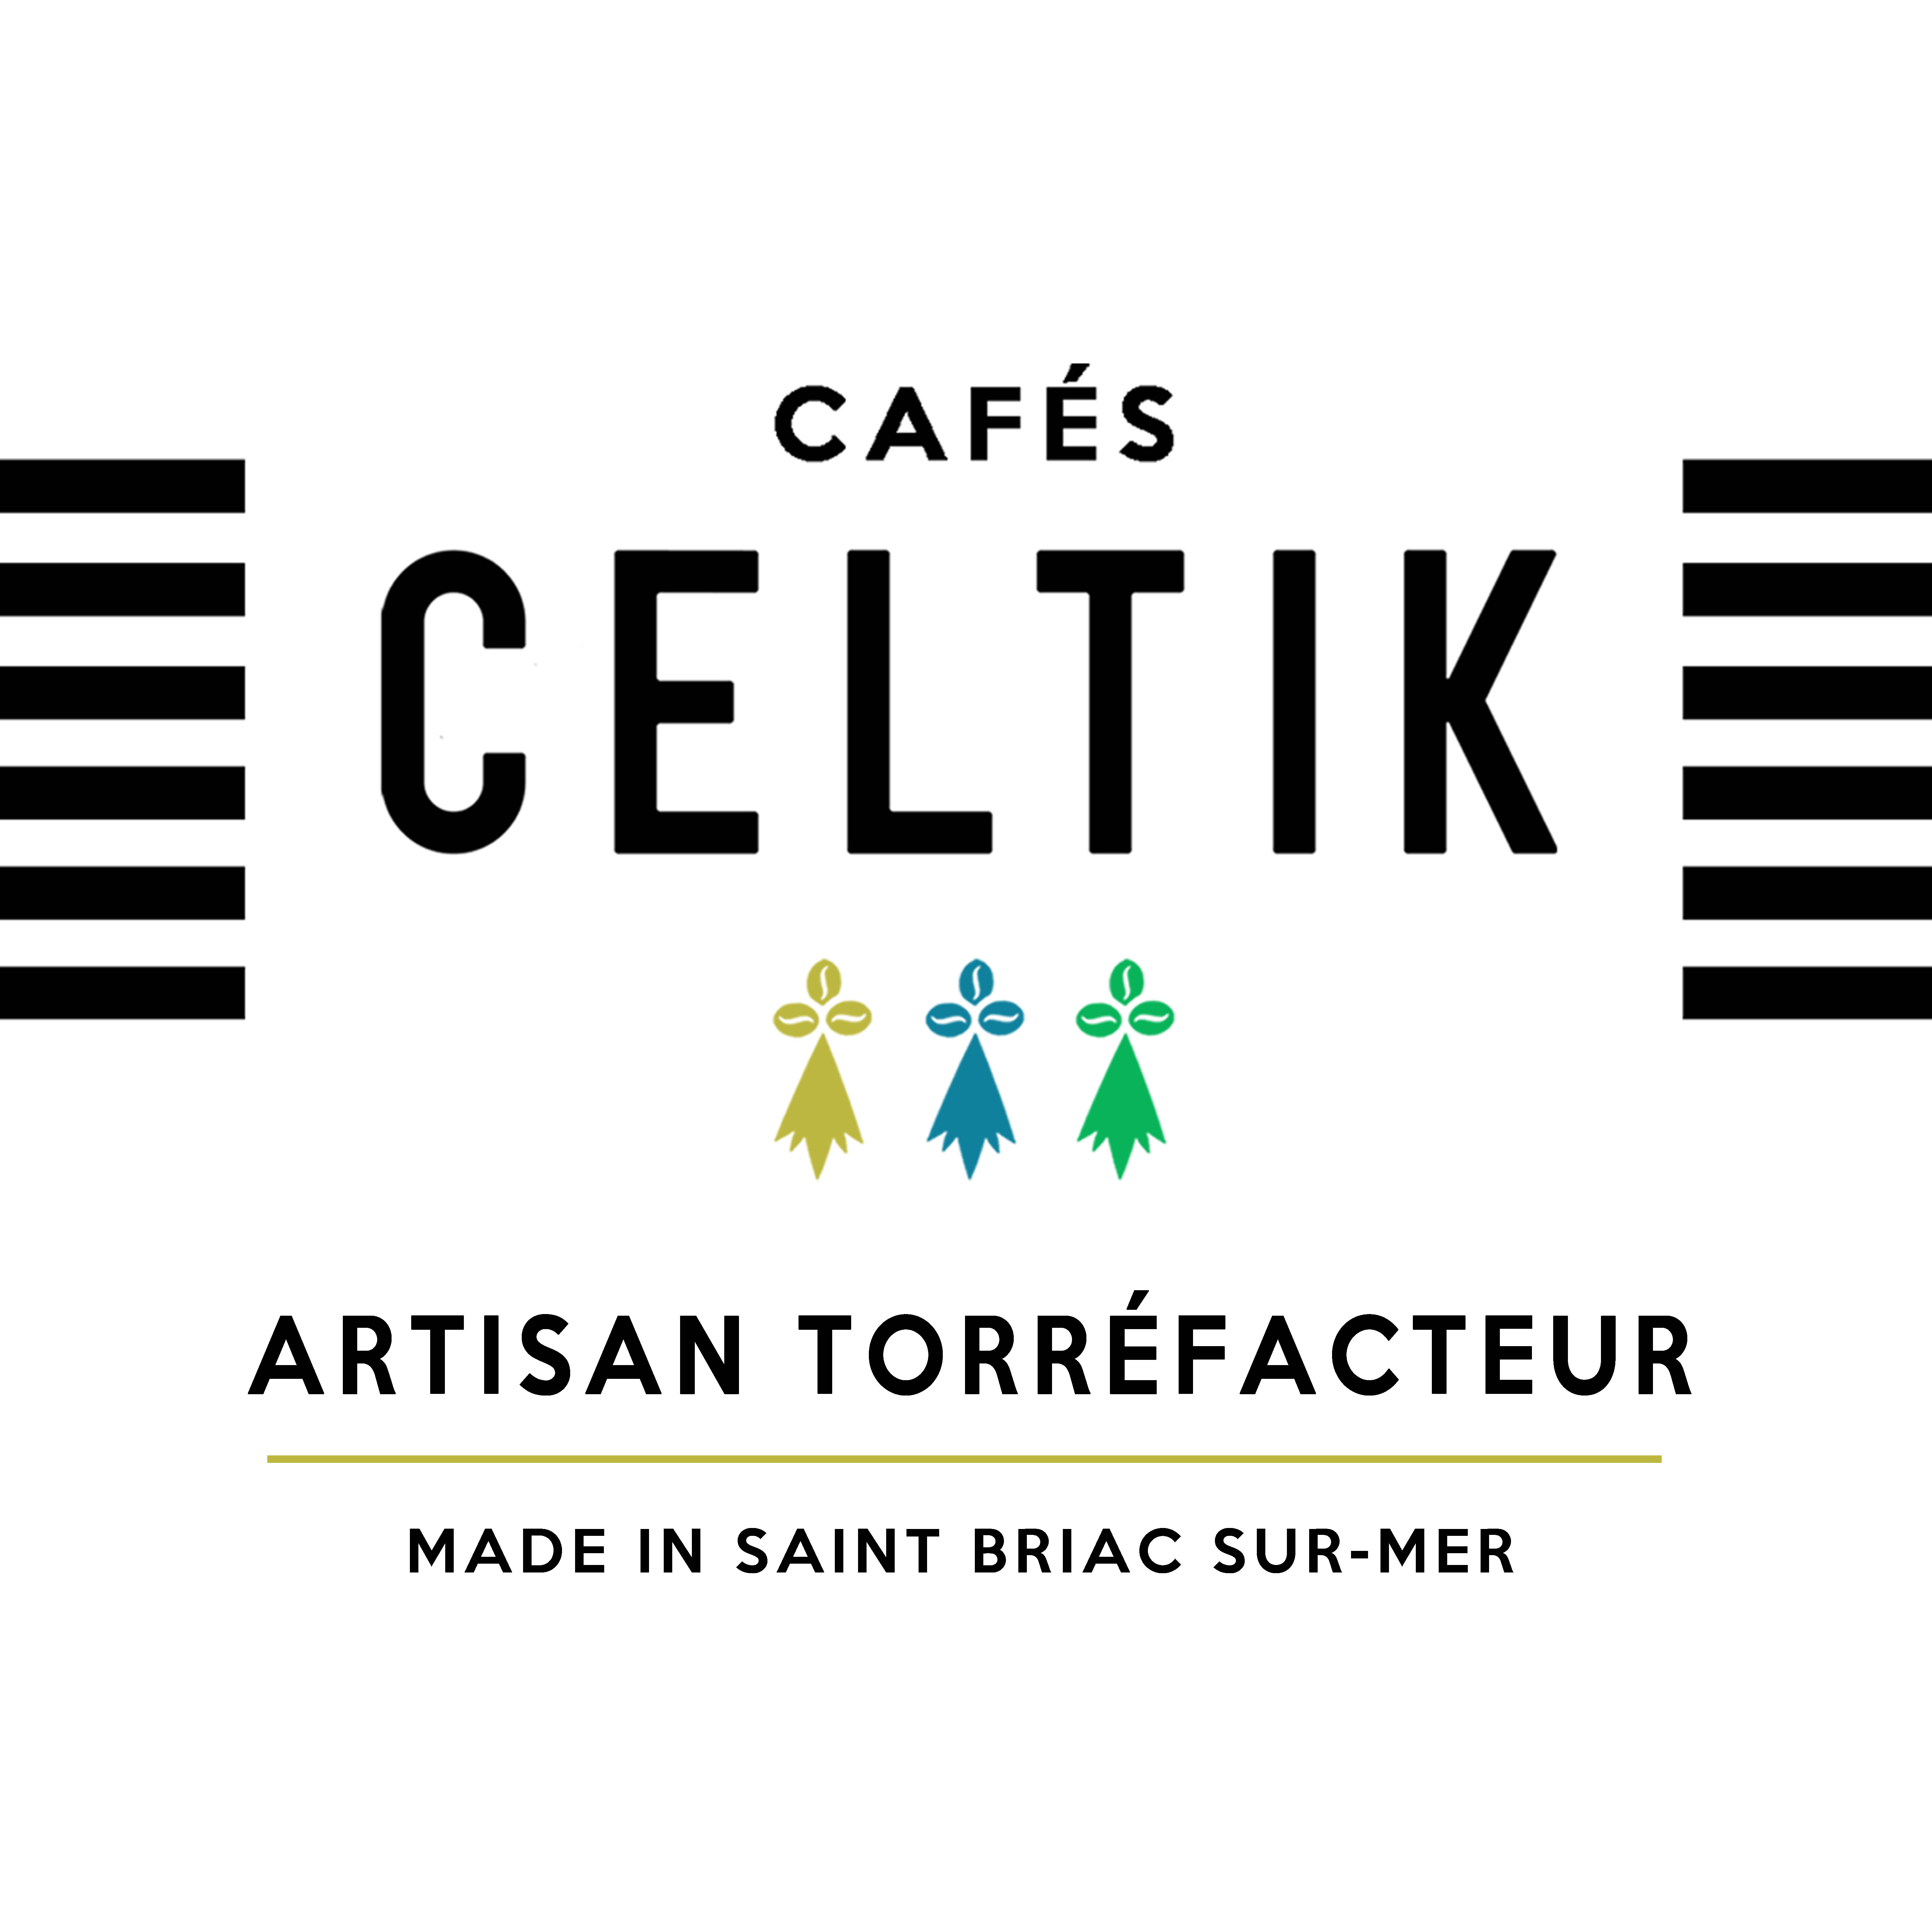 CAFE CELTIK